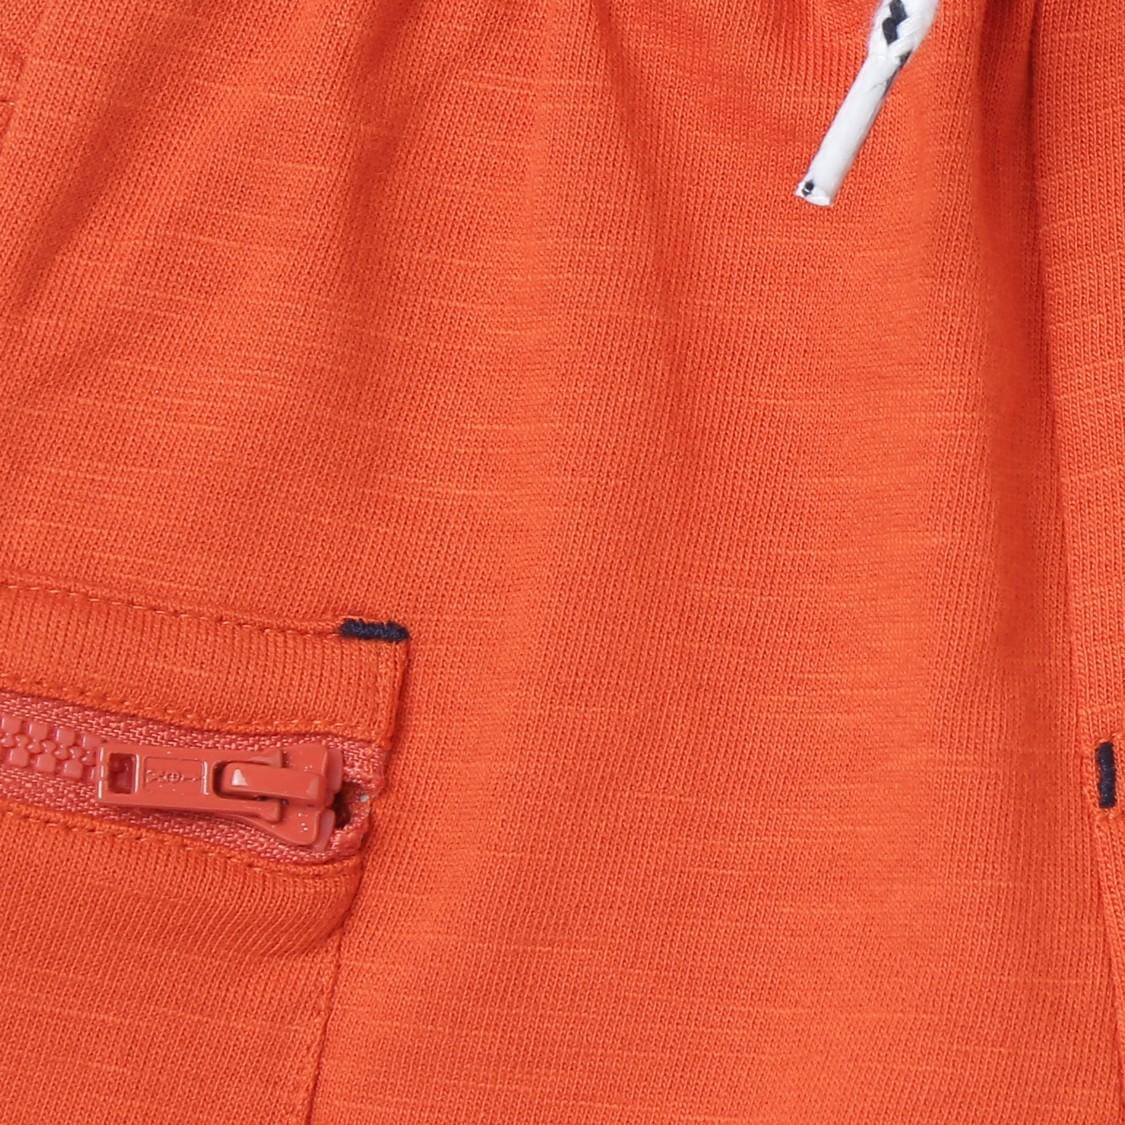 MAX Applique Drawstring Waist Shorts